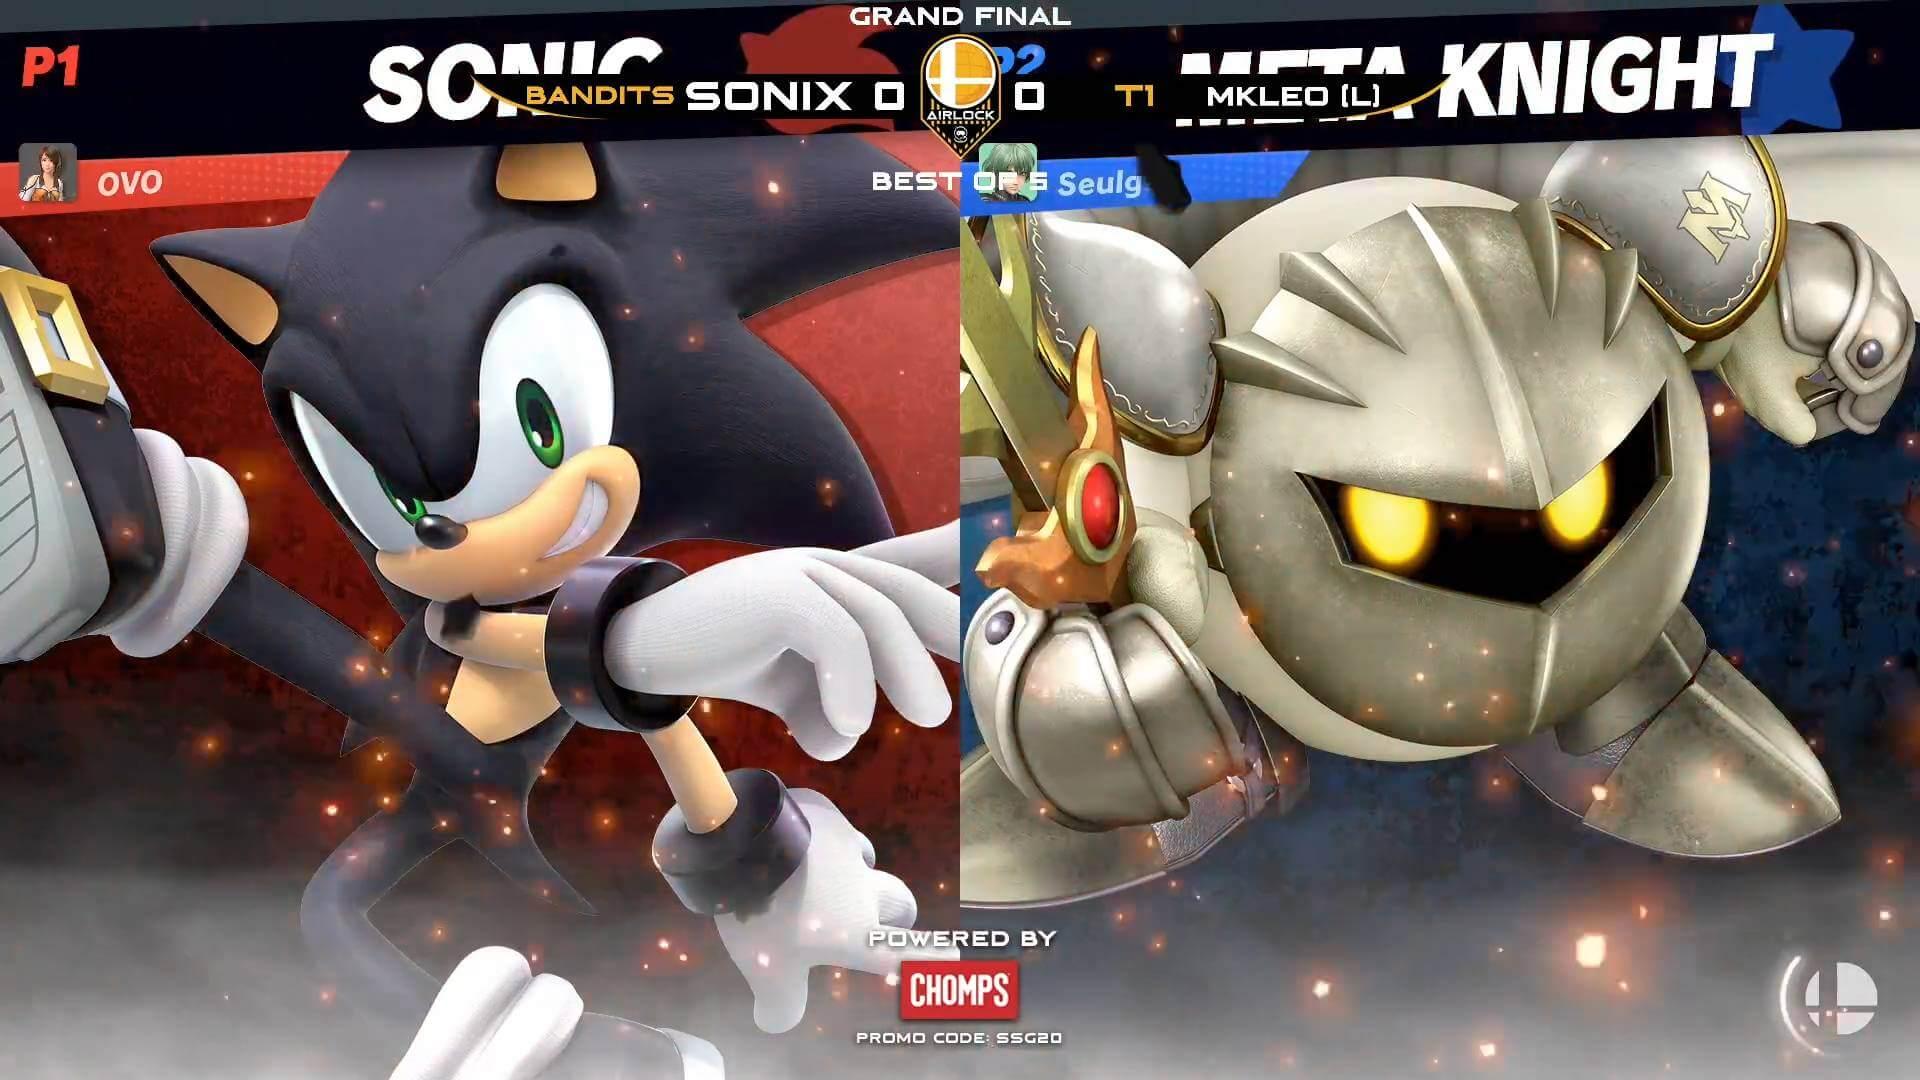 Smash Ultimete esports The Airlock - Grand Final screenshot